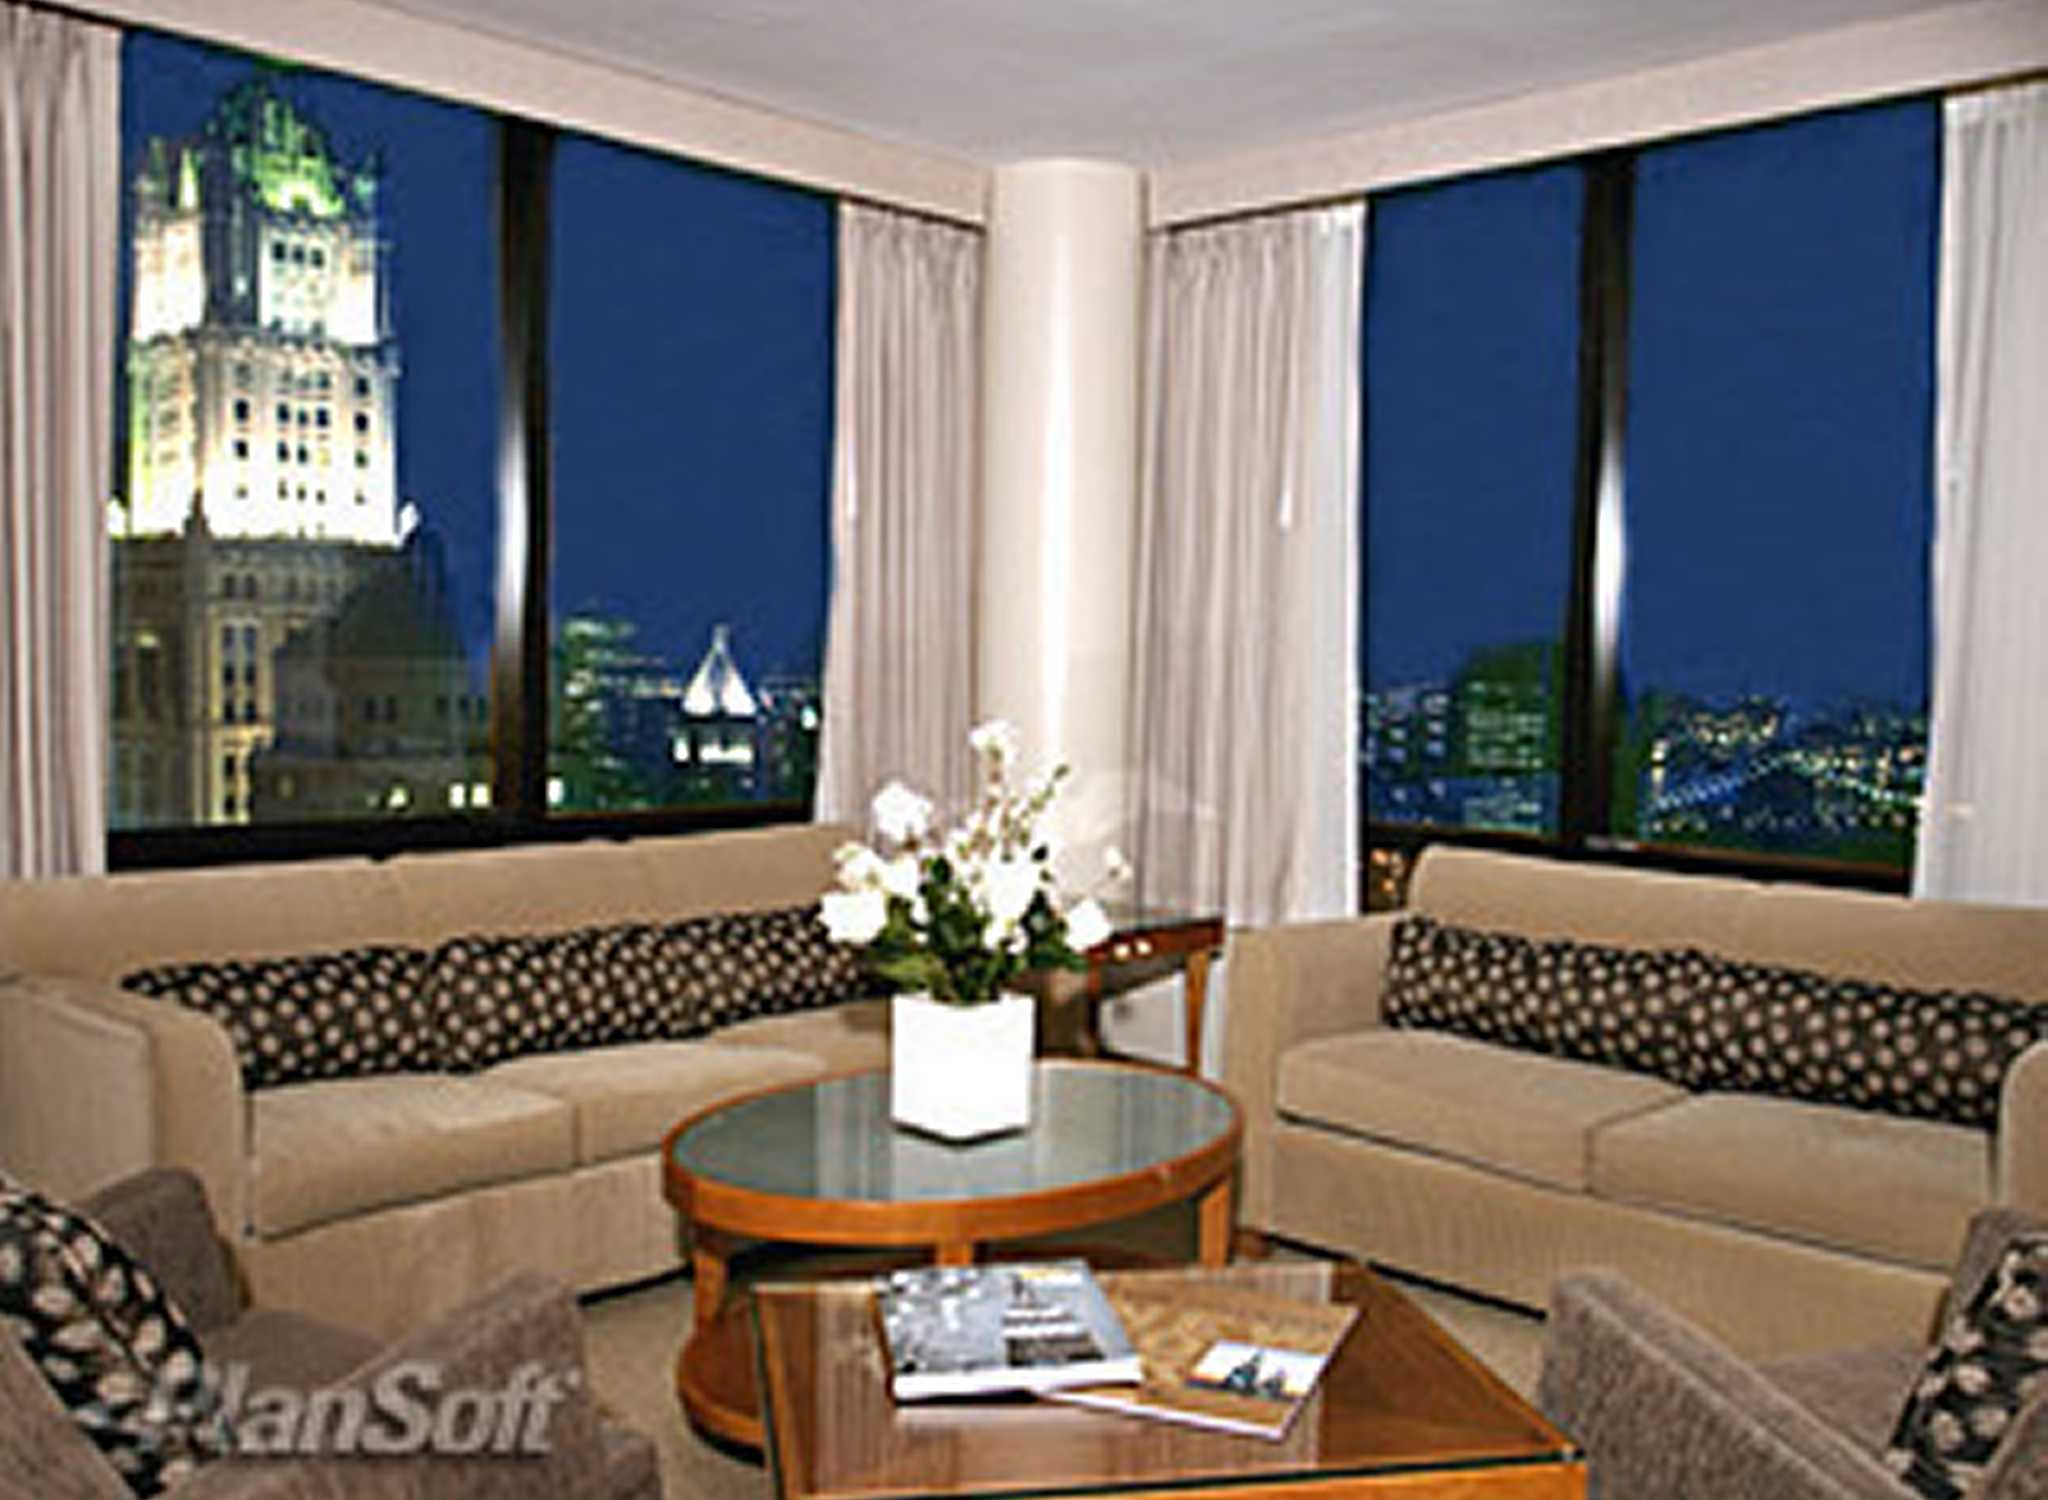 New york monroe county hilton - H Tel Millennium Hilton New York Downtown Suite Living Area